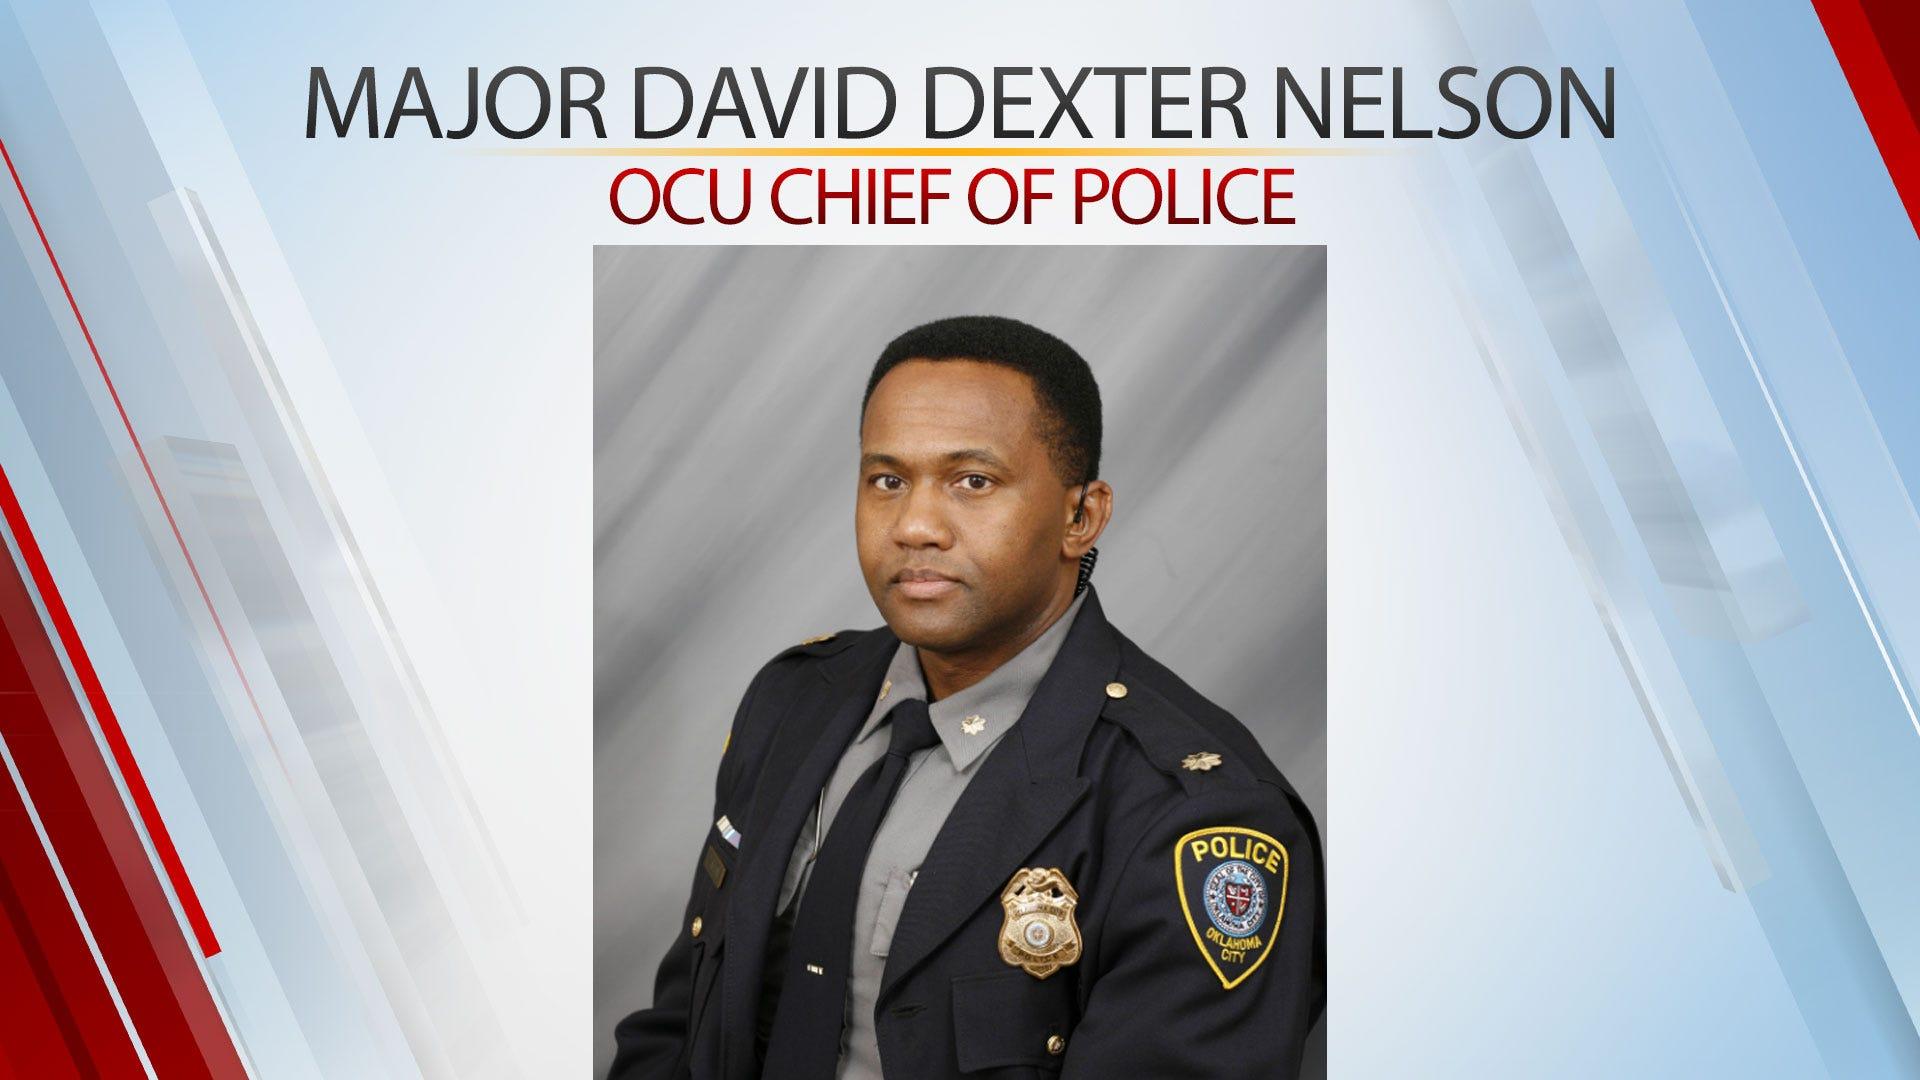 OCU President Announces Major David Dexter Nelson As Chief Of Police At University